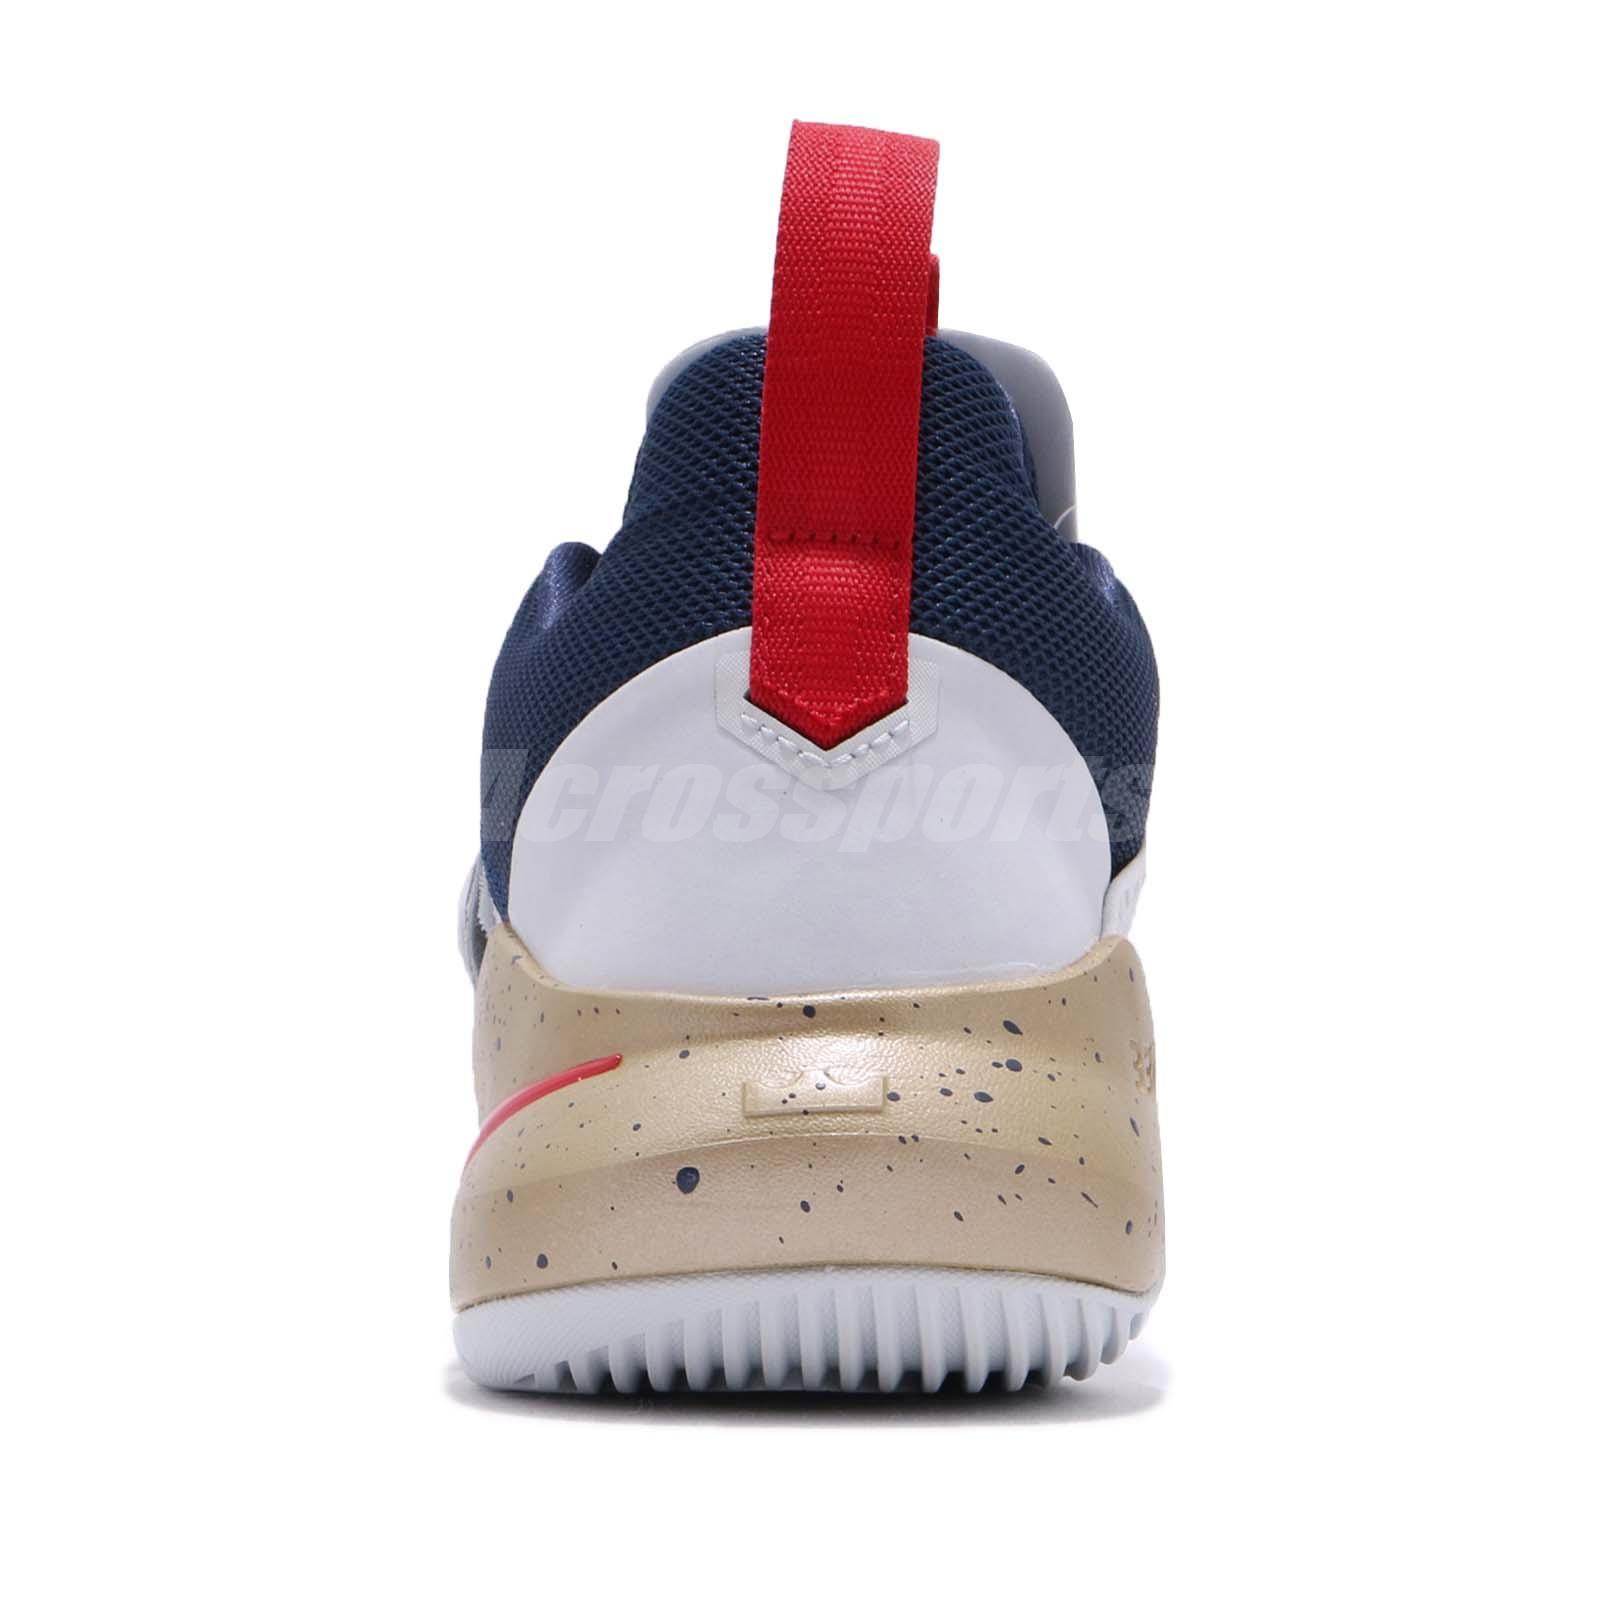 0c6a9ad0ce2b Nike Ambassador XI 11 Lebron James LBJ White Red Gold Navy Men Shoes ...